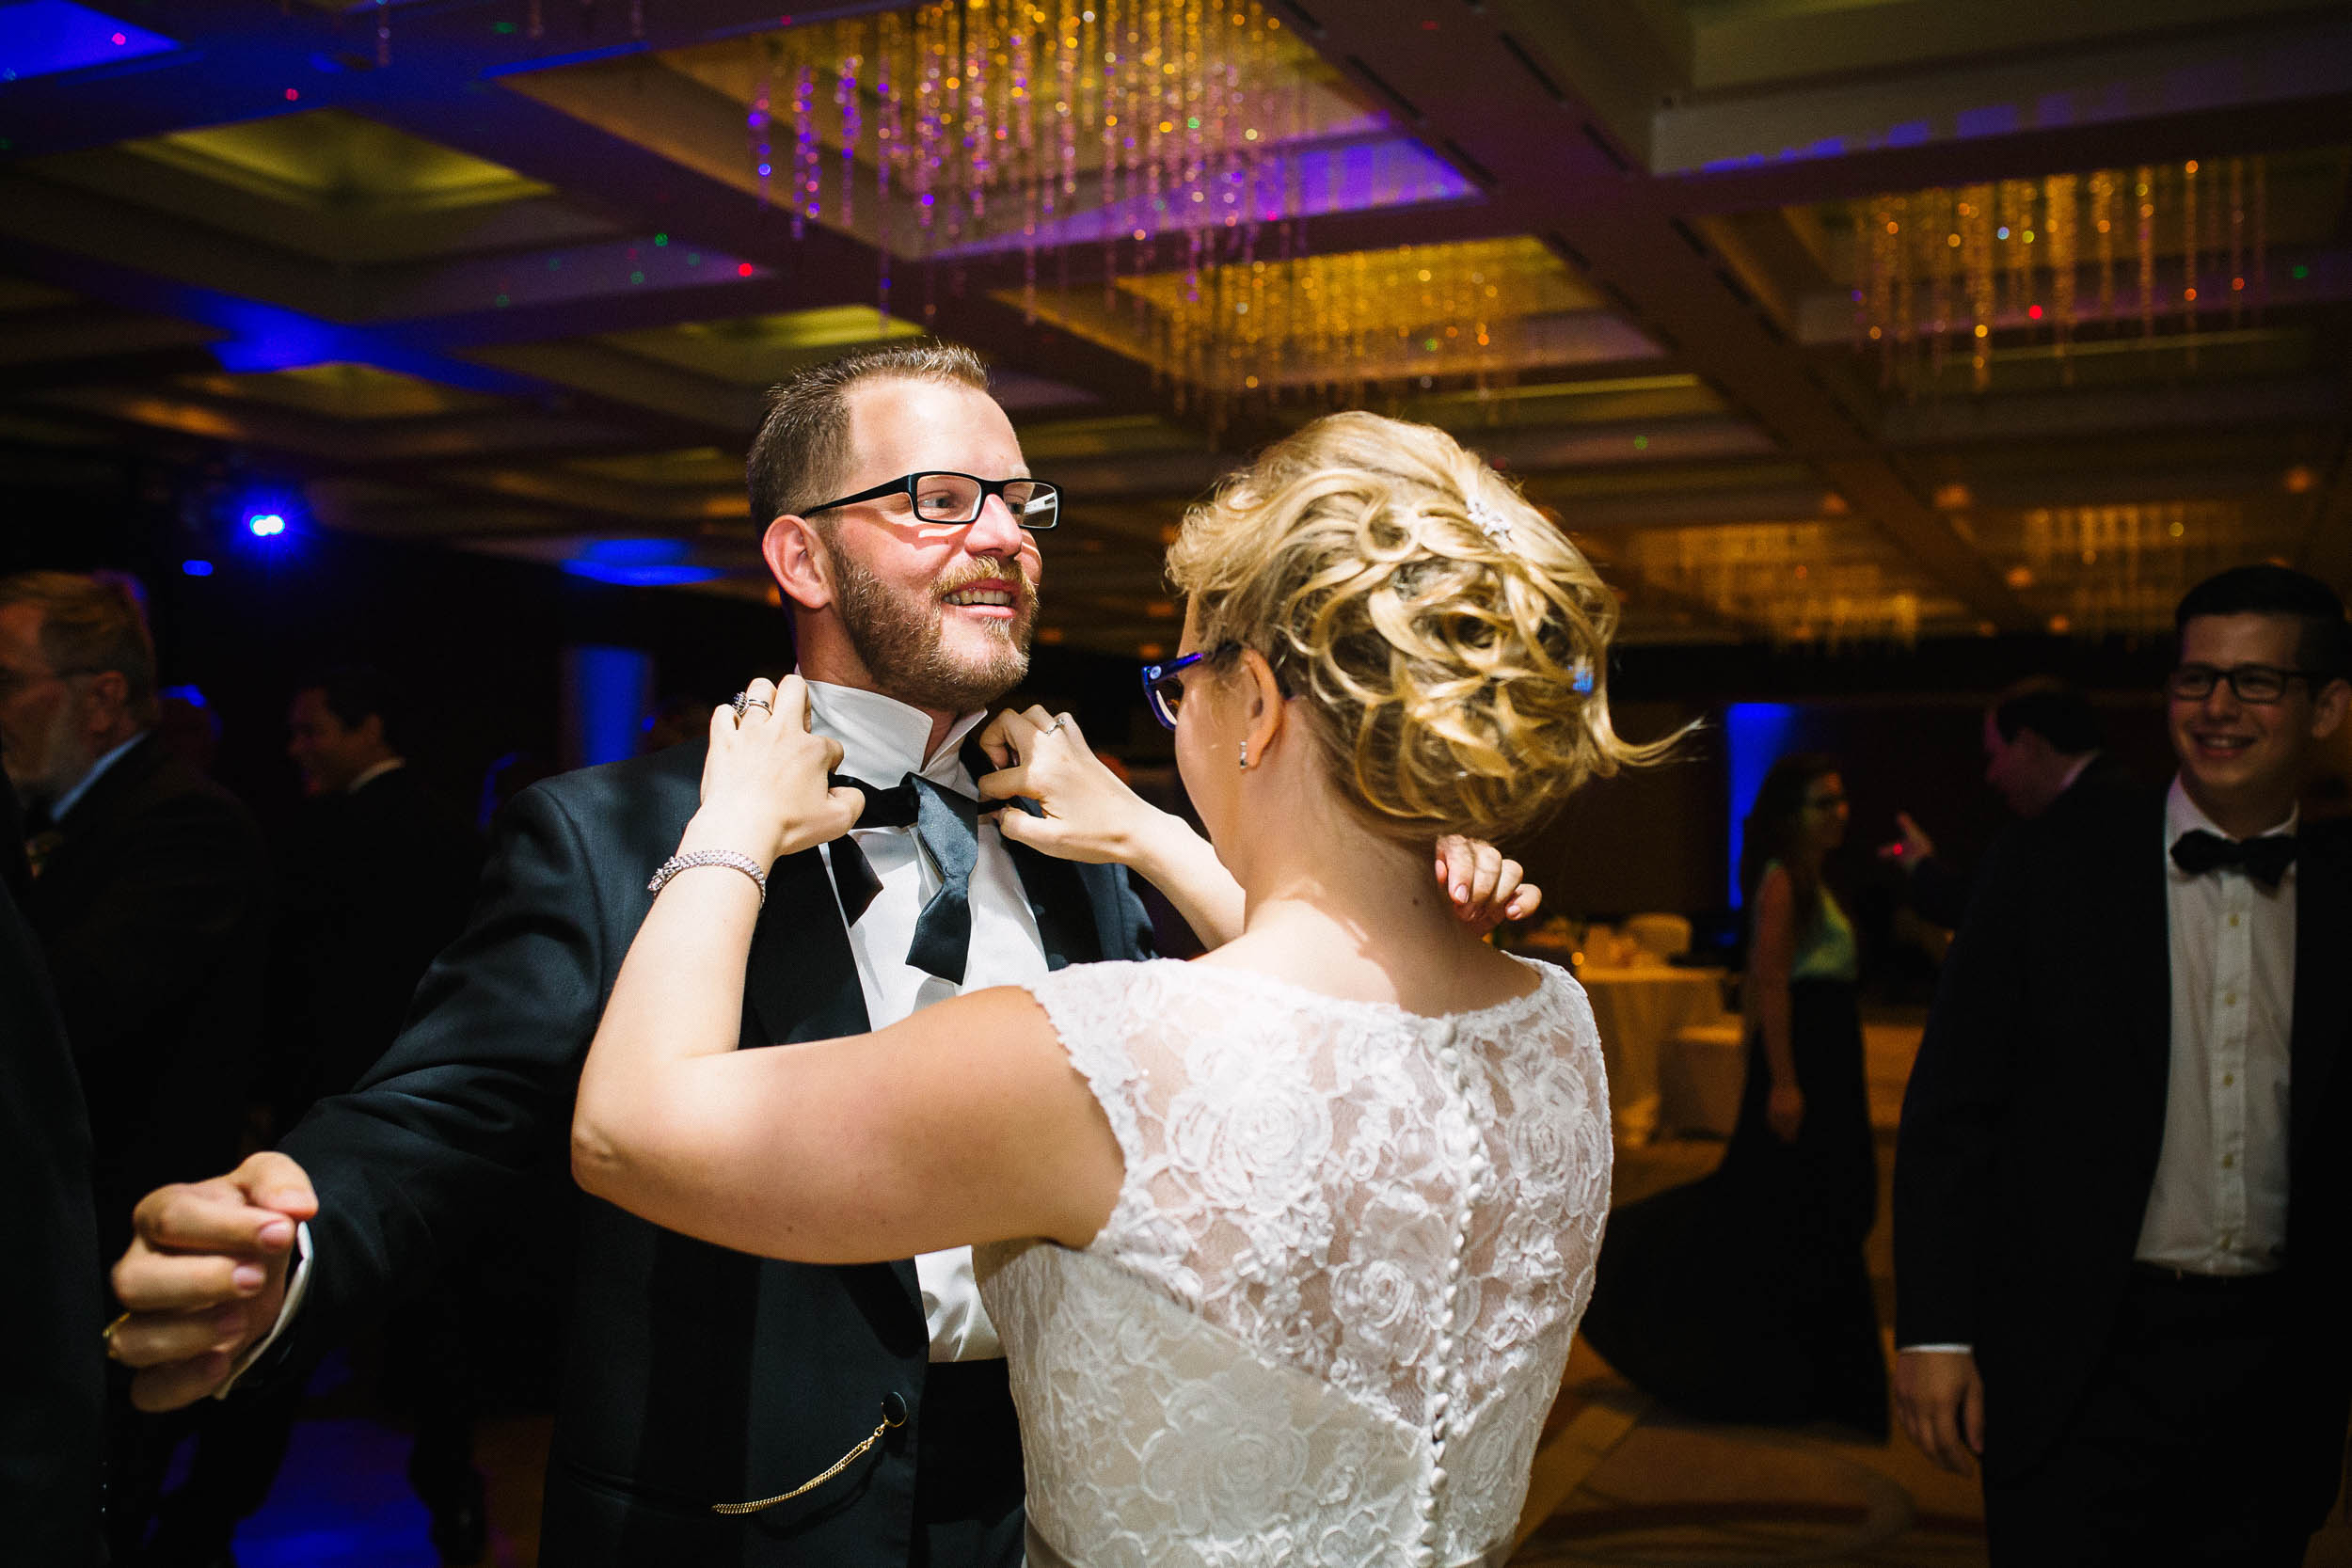 Weddings - Click for wedding photography.